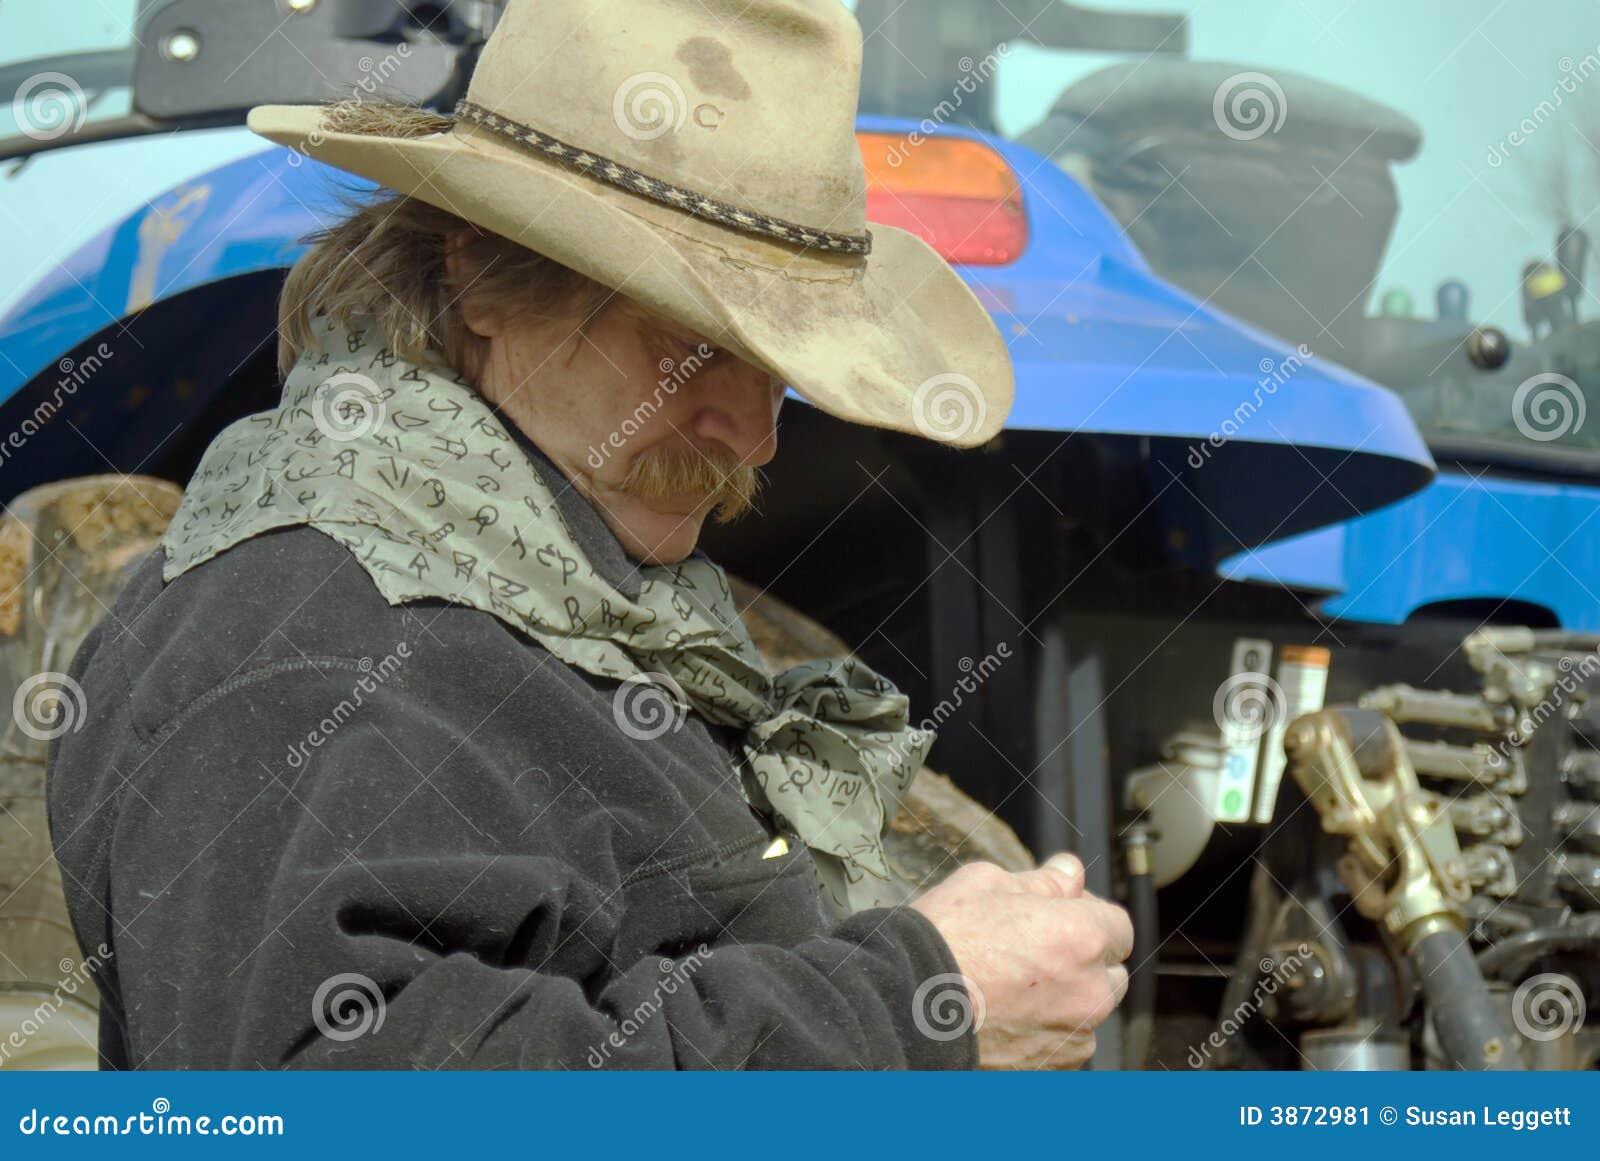 Trabajador de granja